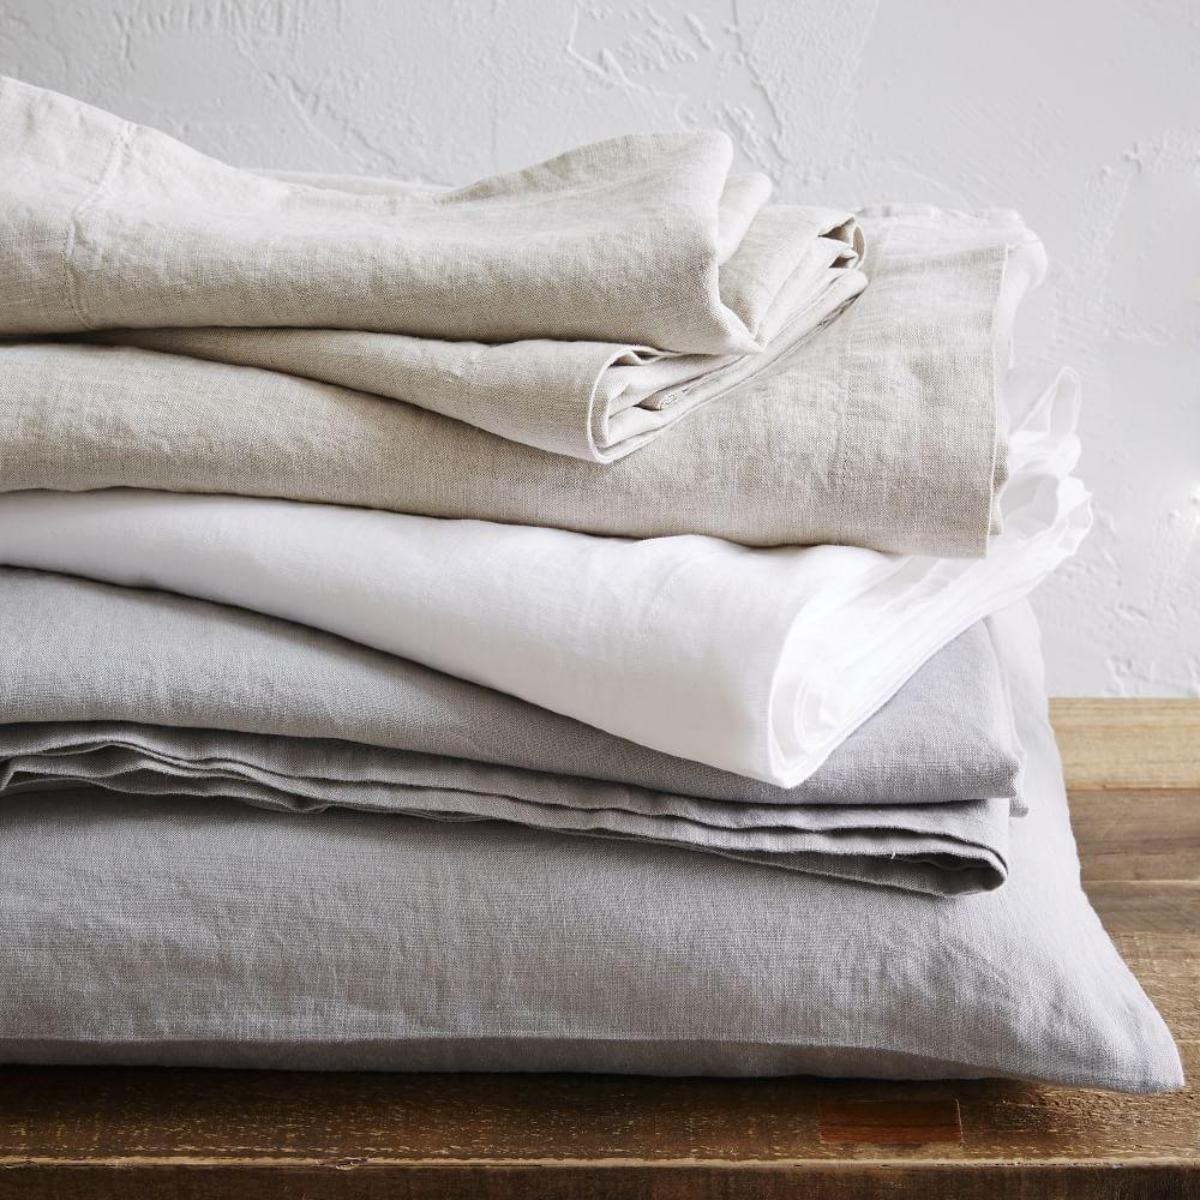 7 Best Places To Buy Pure Linen Bedding   Belgian Flax Bed Linen, £59